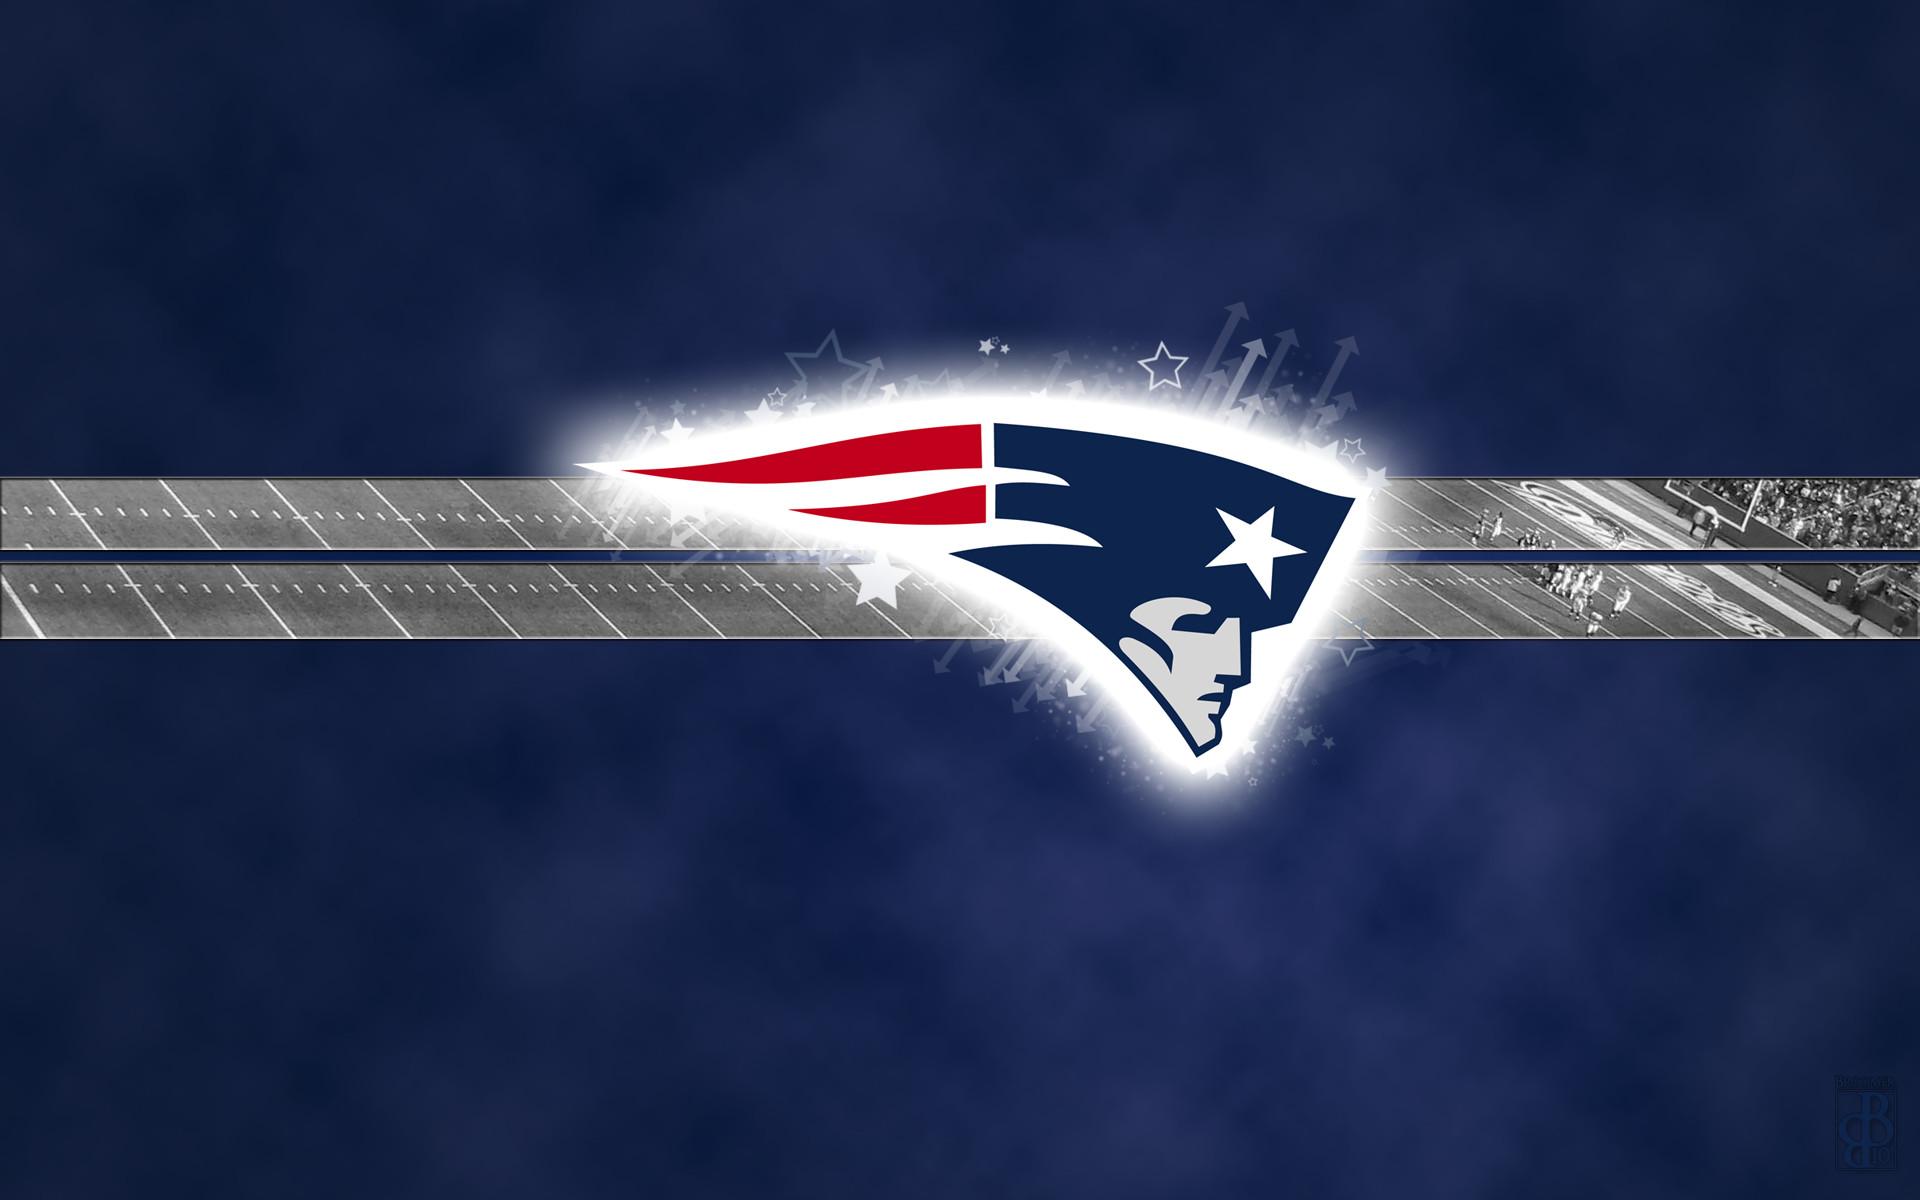 New England Patriots Wallpaper | Quilting | Pinterest | England patriots  and Patriots